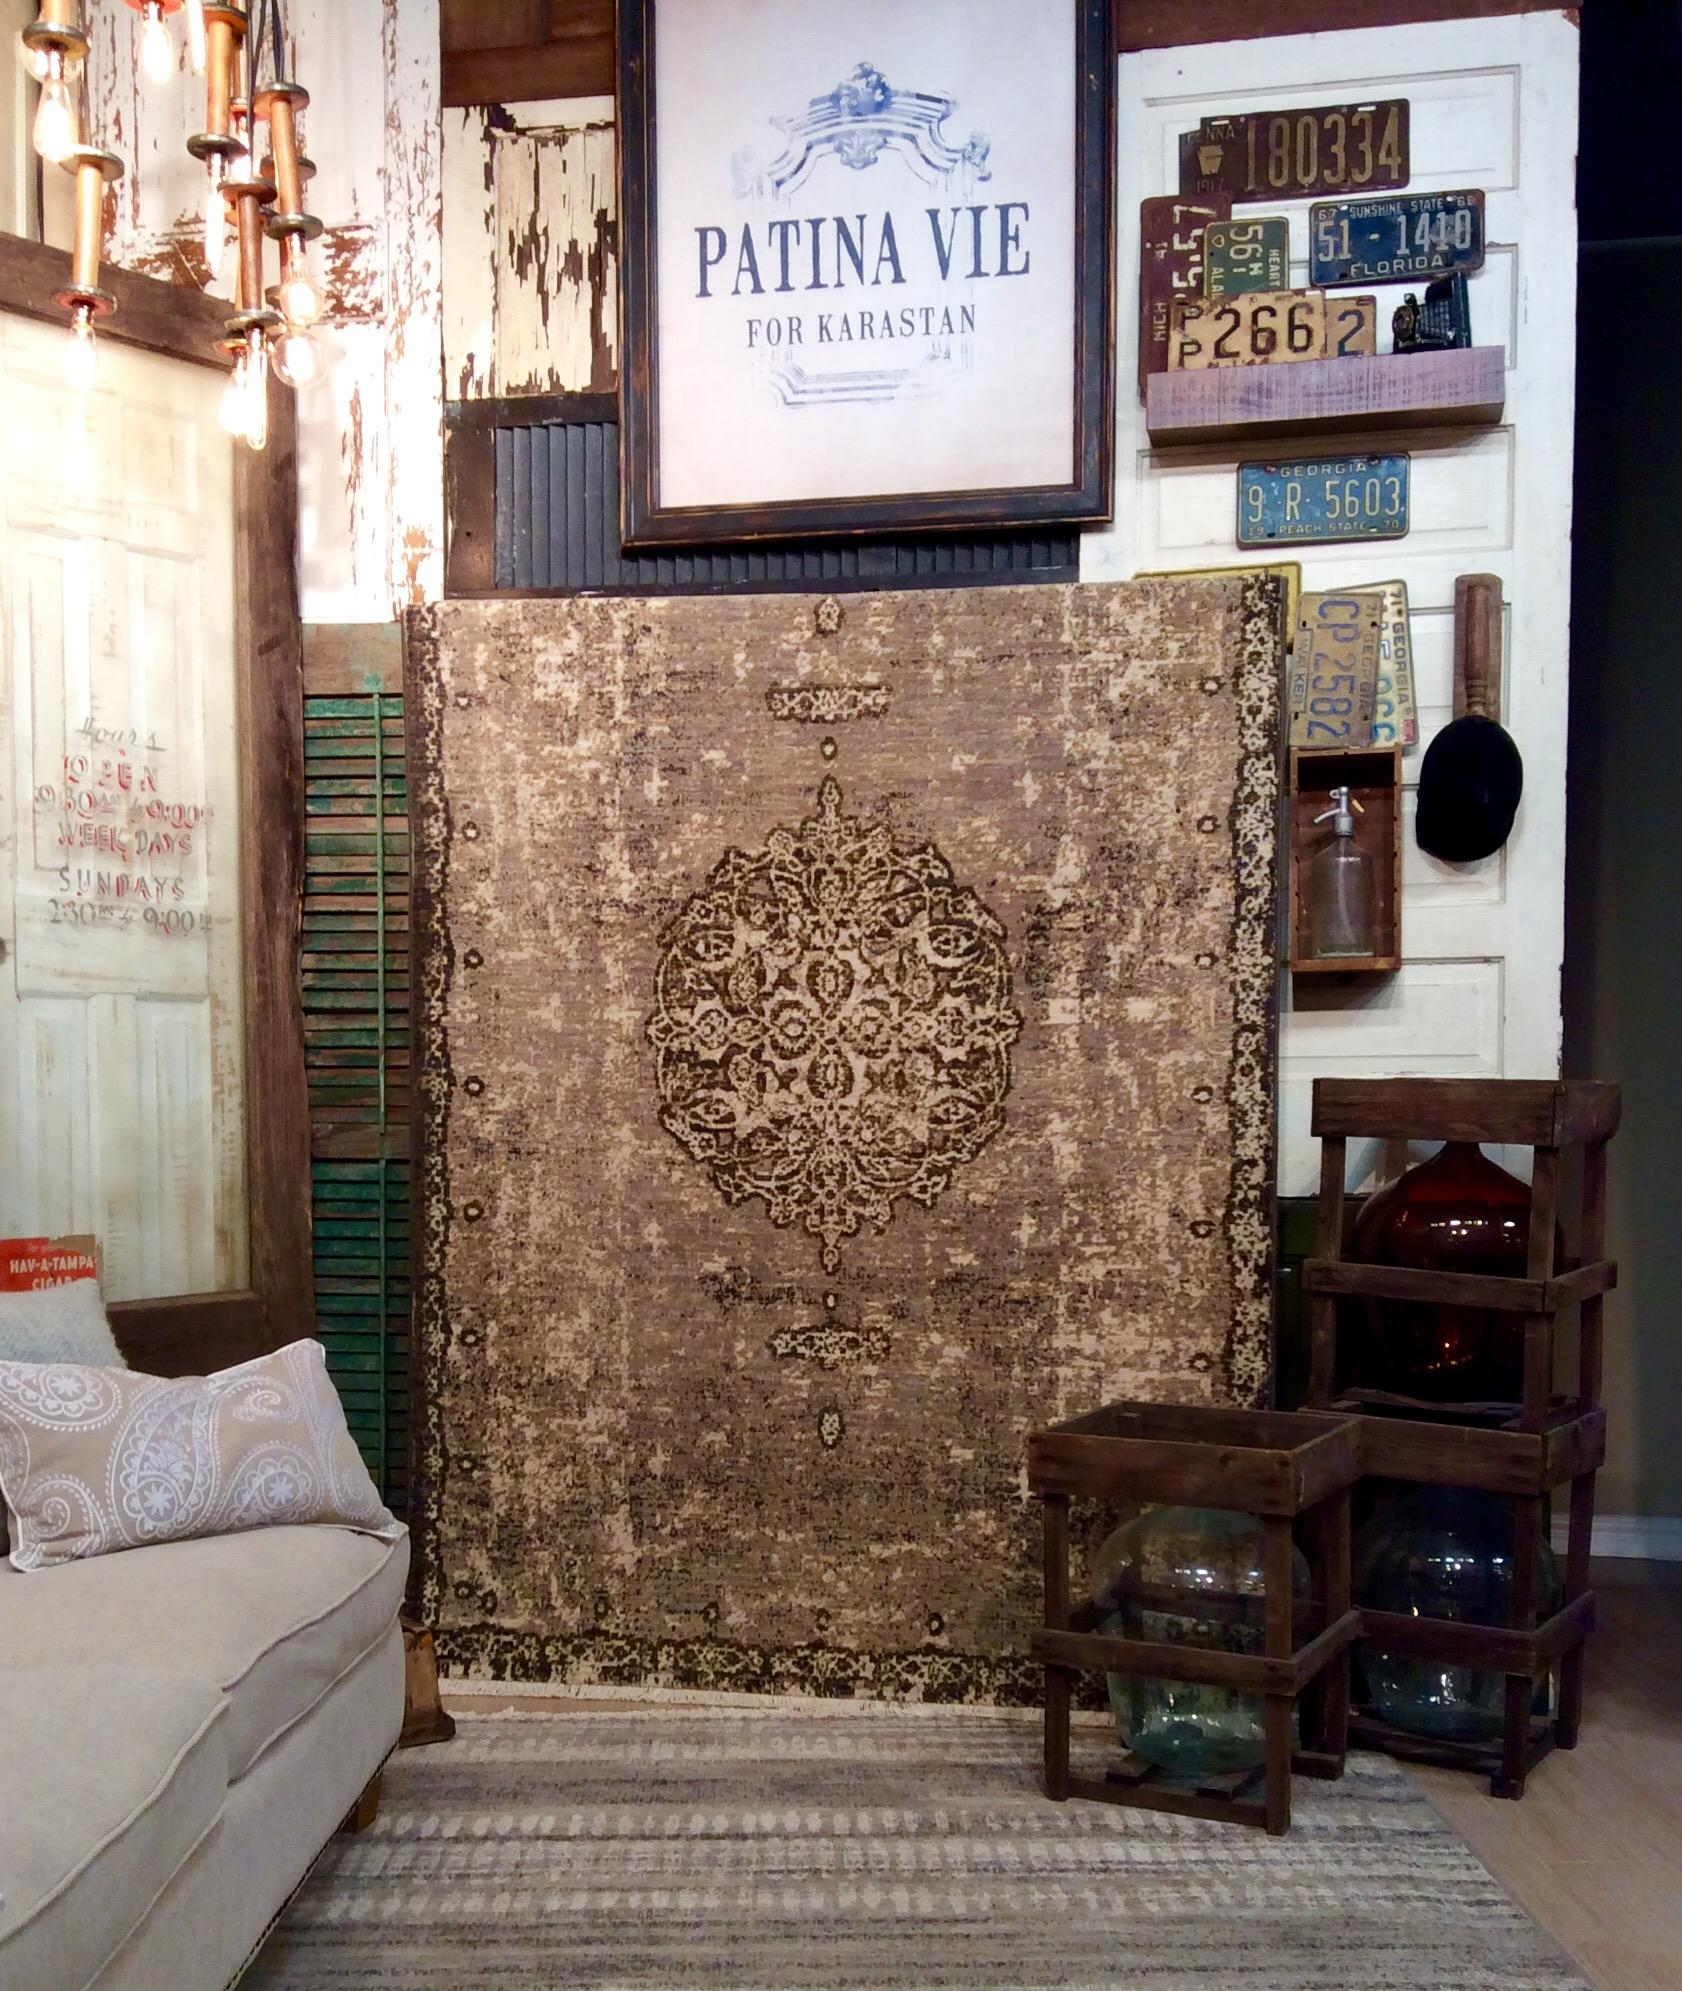 NEW From Karastan/Mohawk Industries The Patina Vie